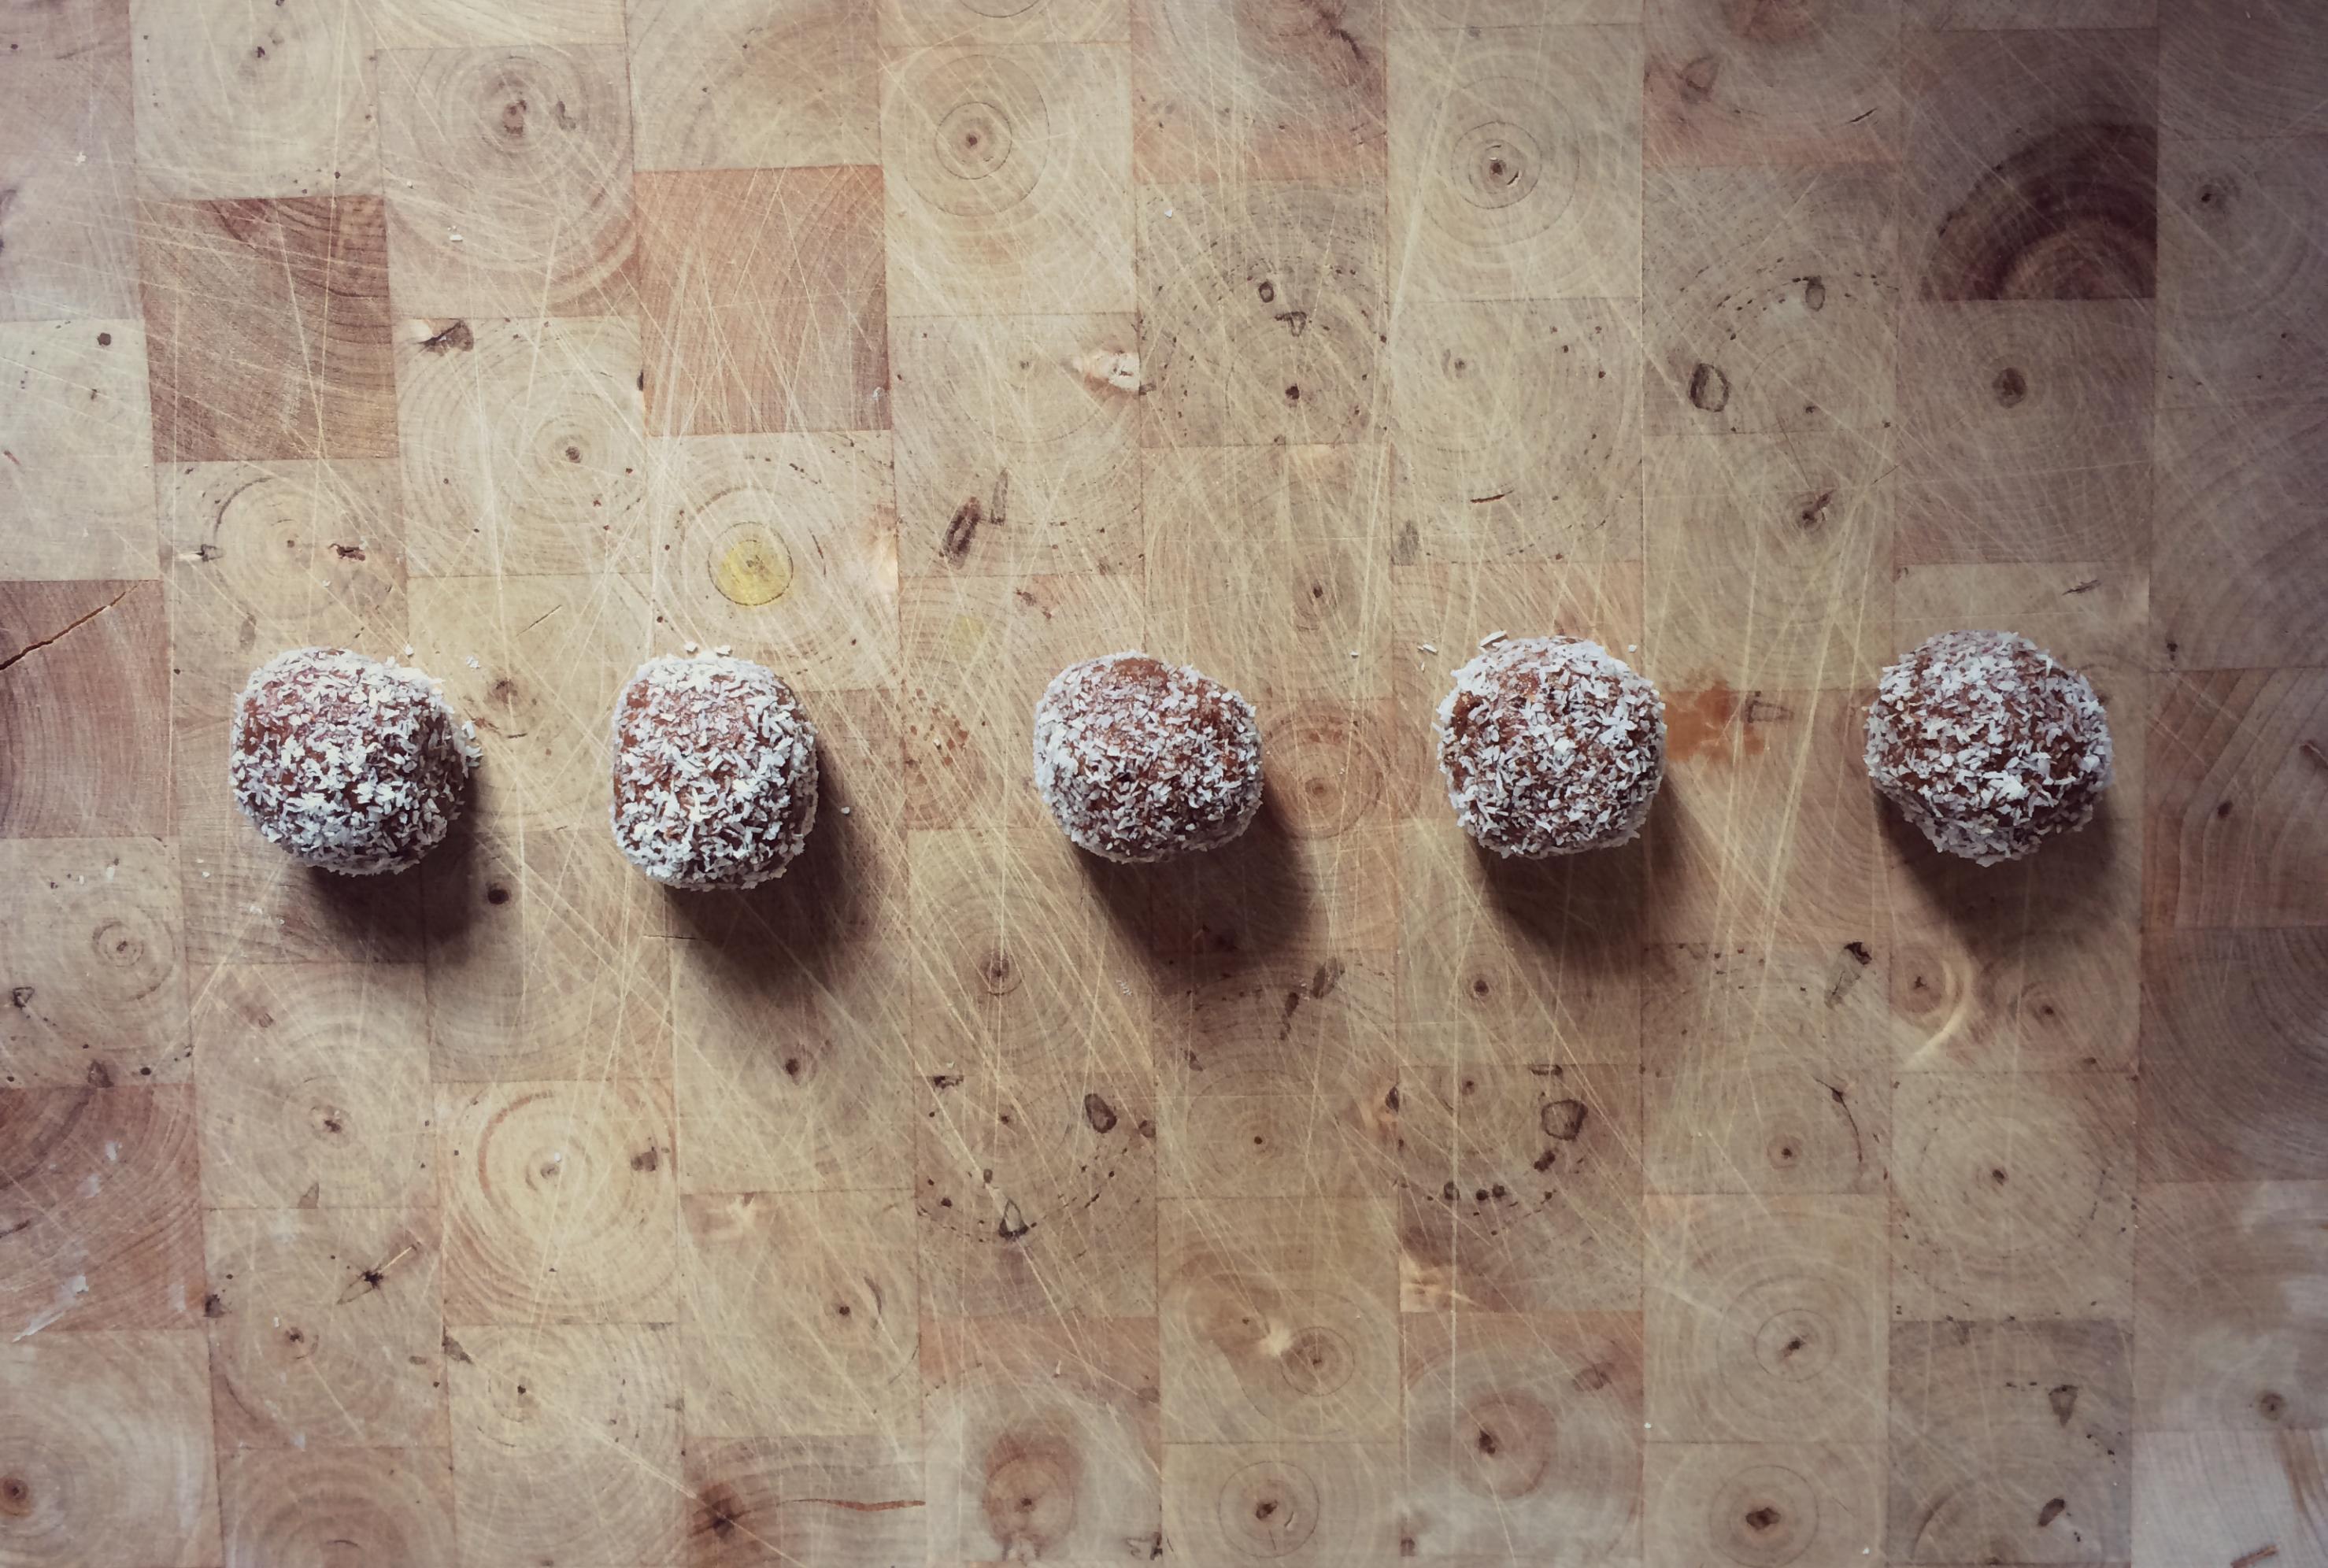 Shannon's Chocolate Salty Balls | Shannon's Kitchen